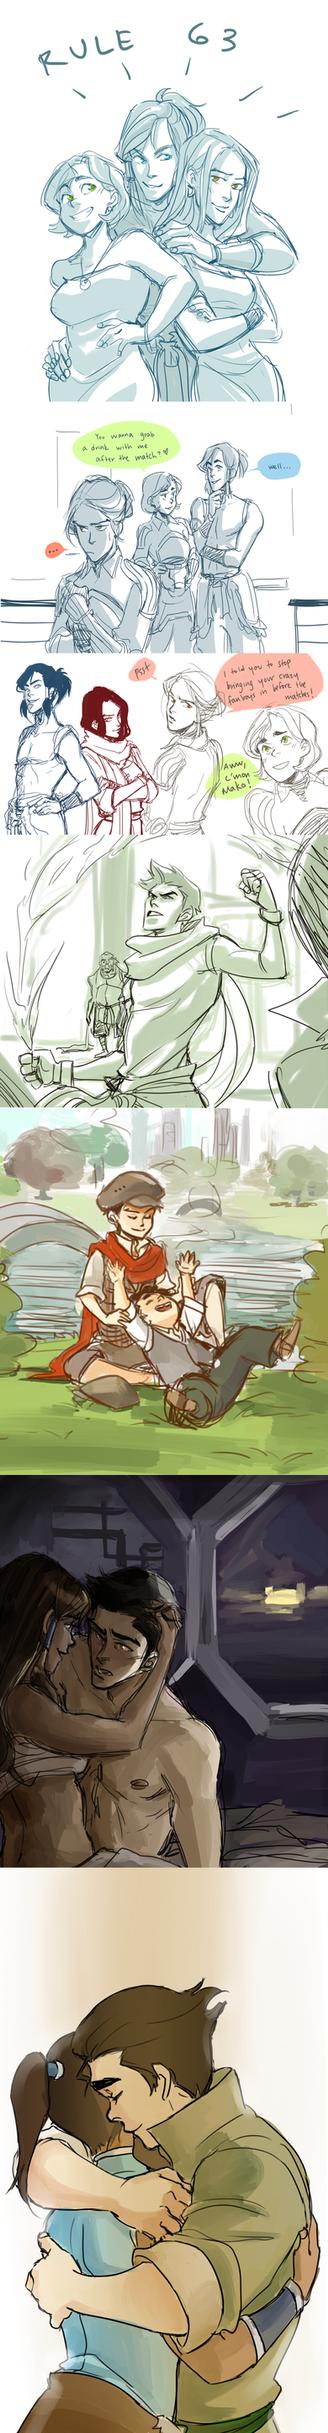 Korra: sketch dump 3 by Minuiko